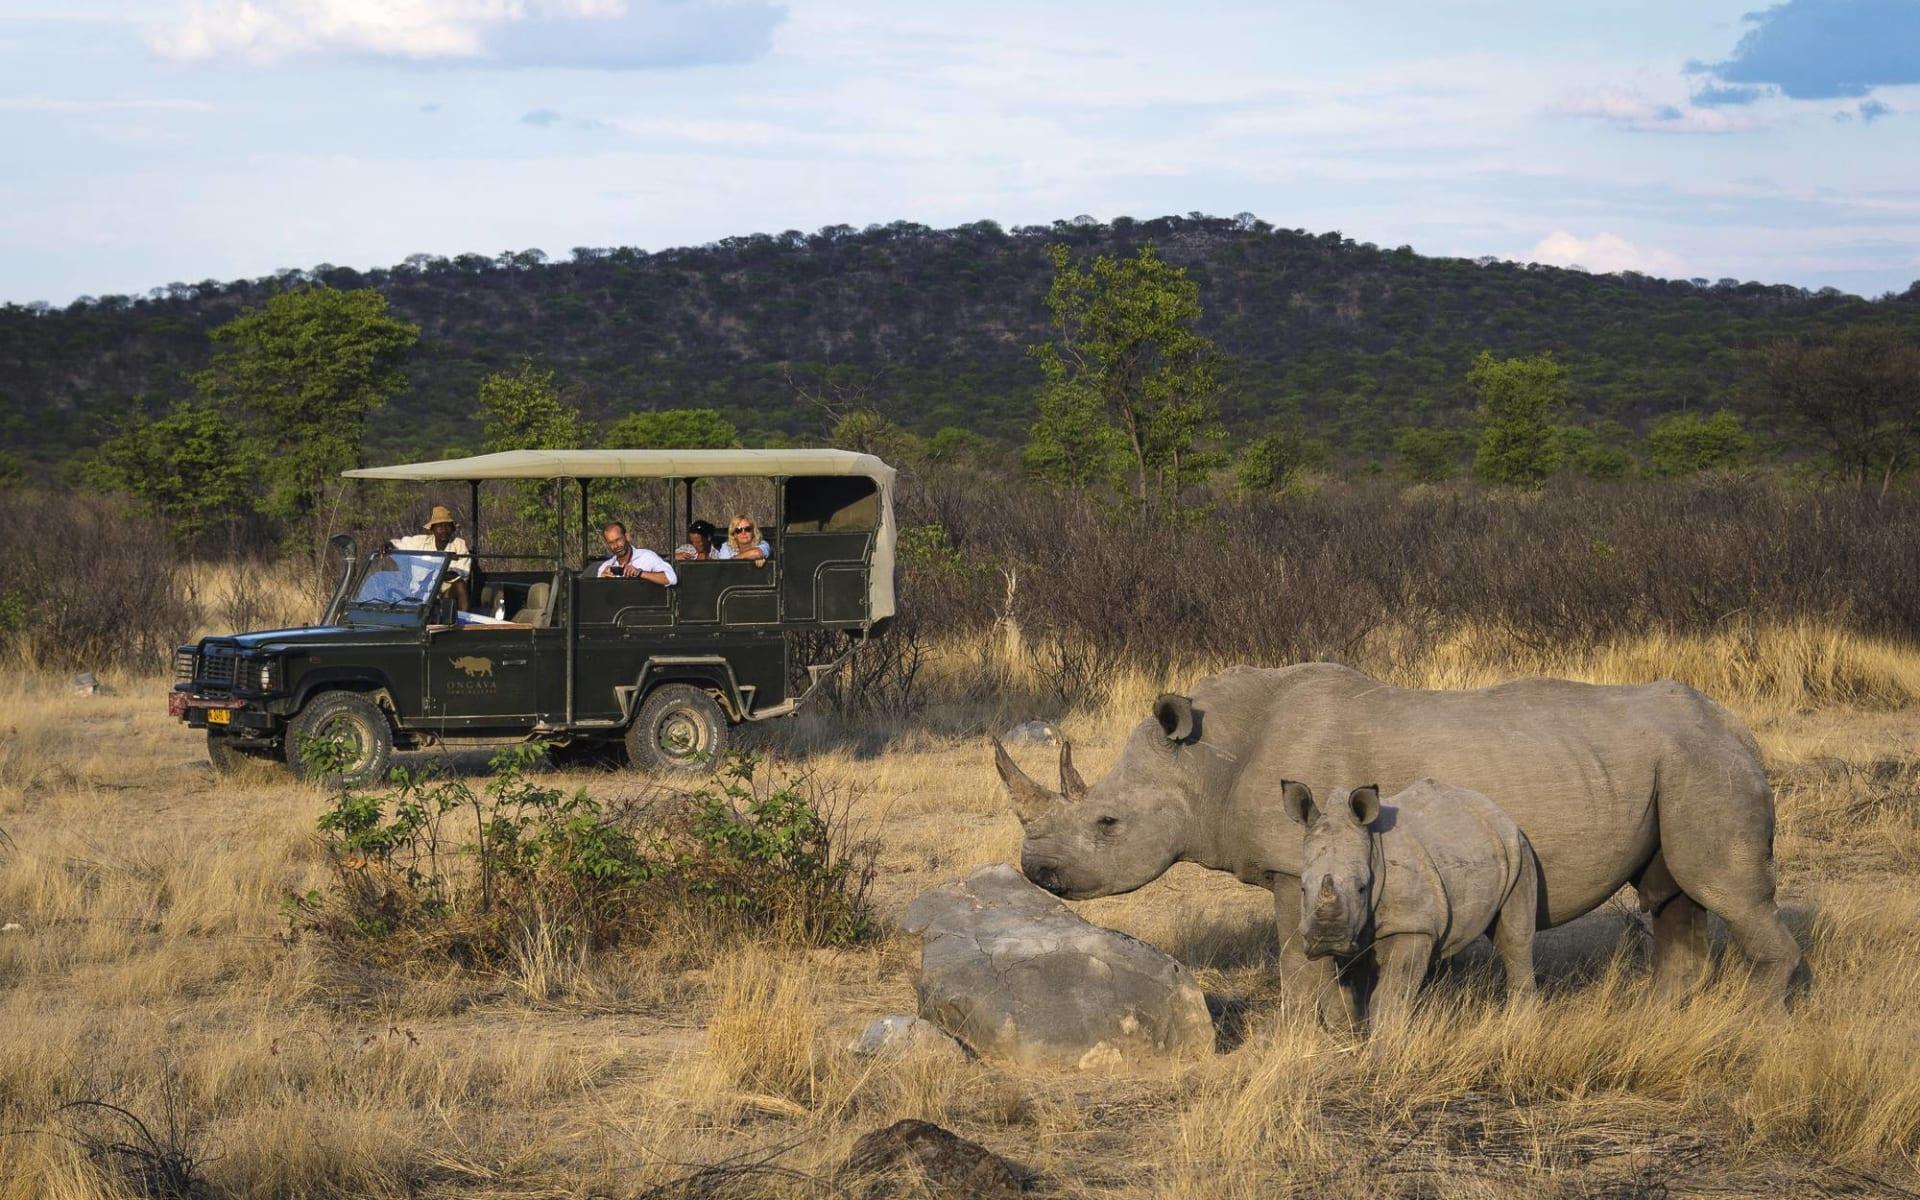 Ongava Lodge in Etosha Nationalpark:  Safarifahrzeug und Nashörner